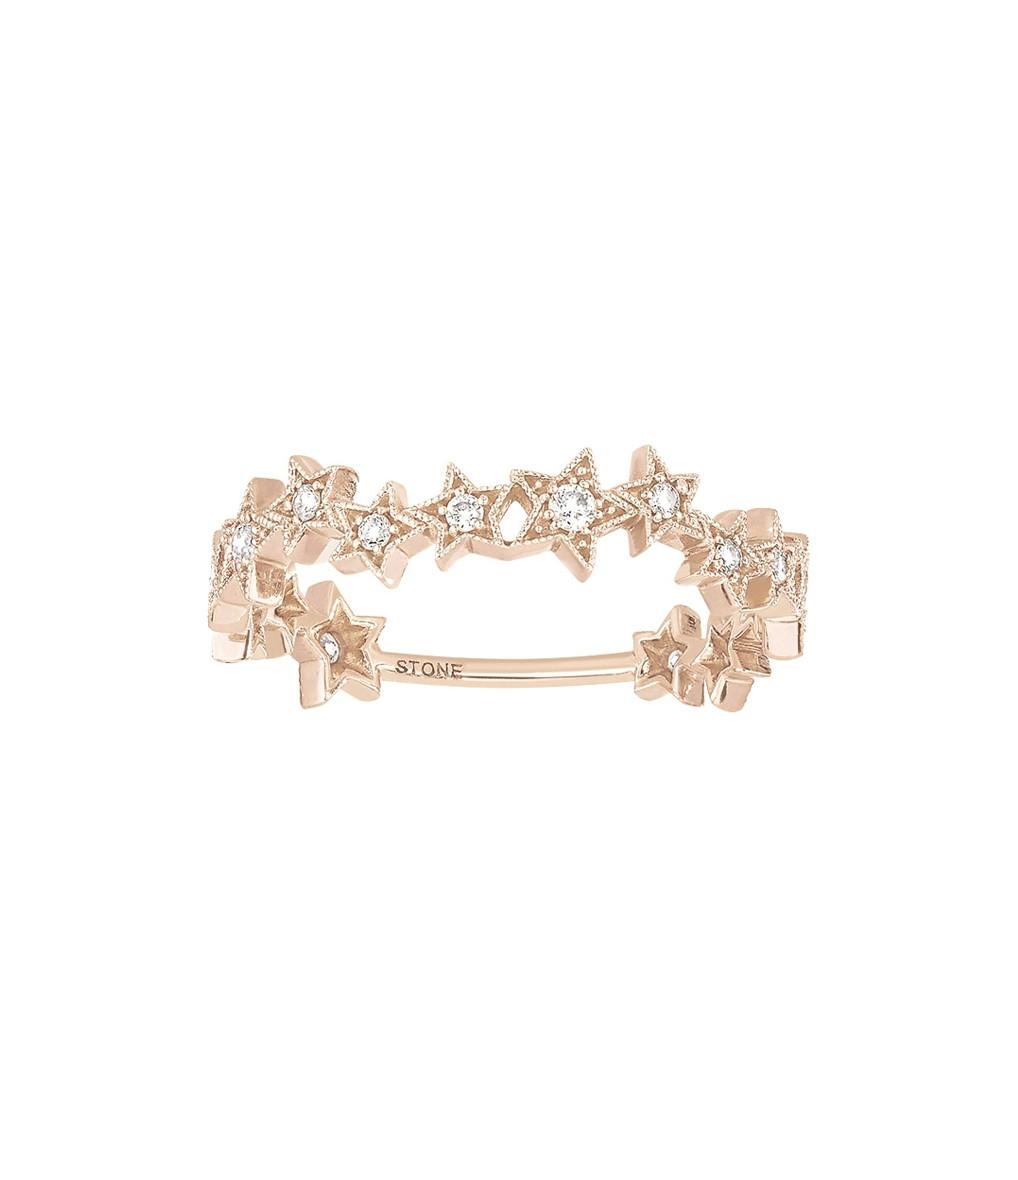 Bague Stardust Or Diamants - Stone